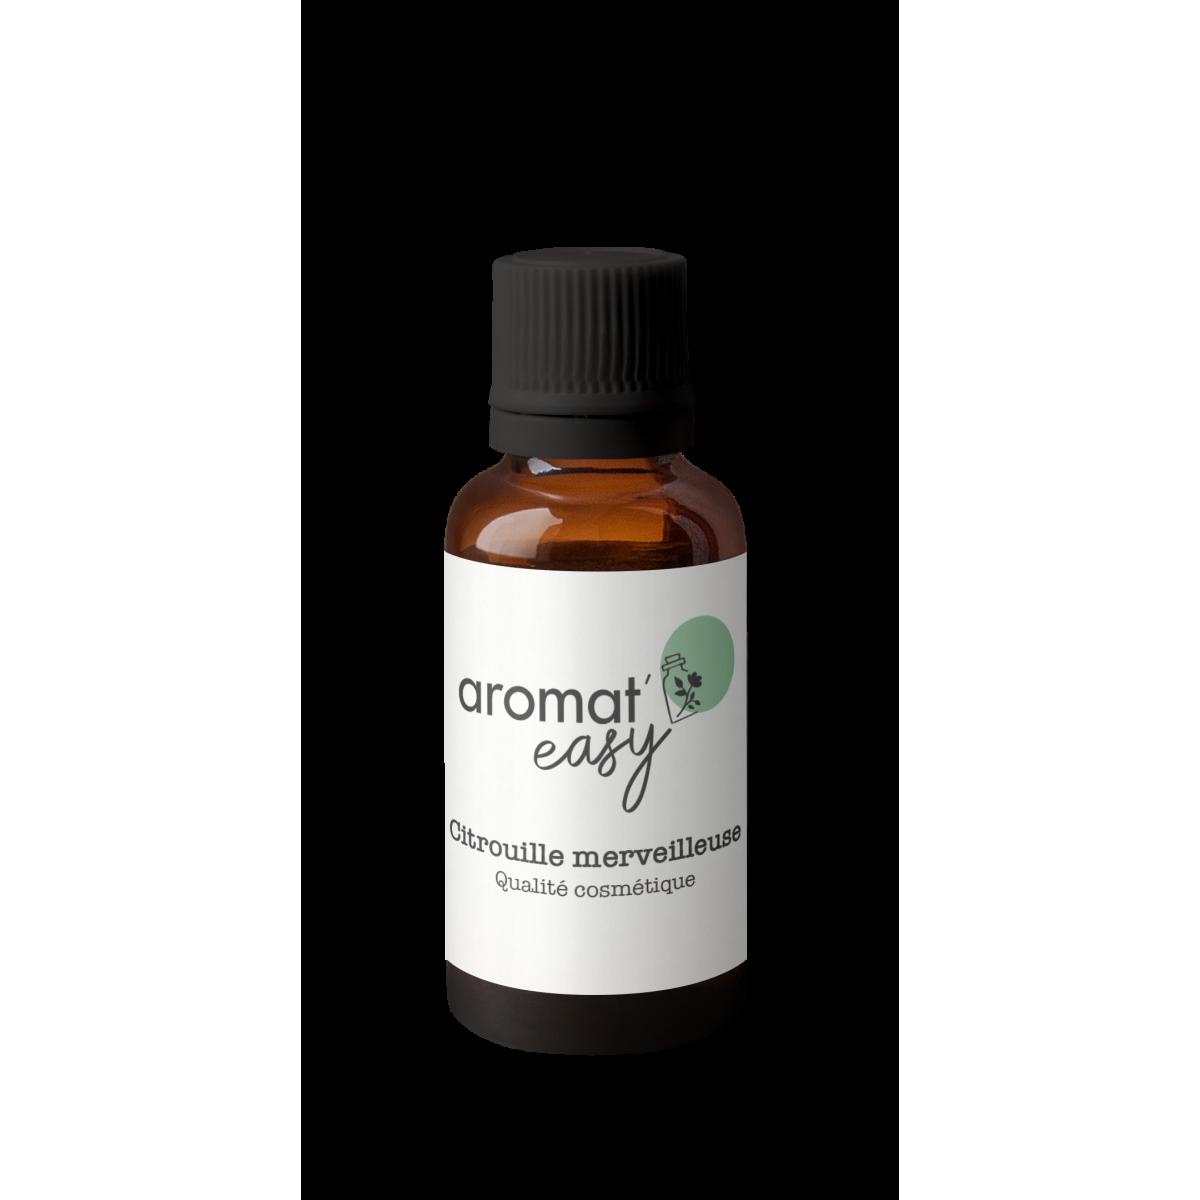 Fragrance Citrouille merveilleuse